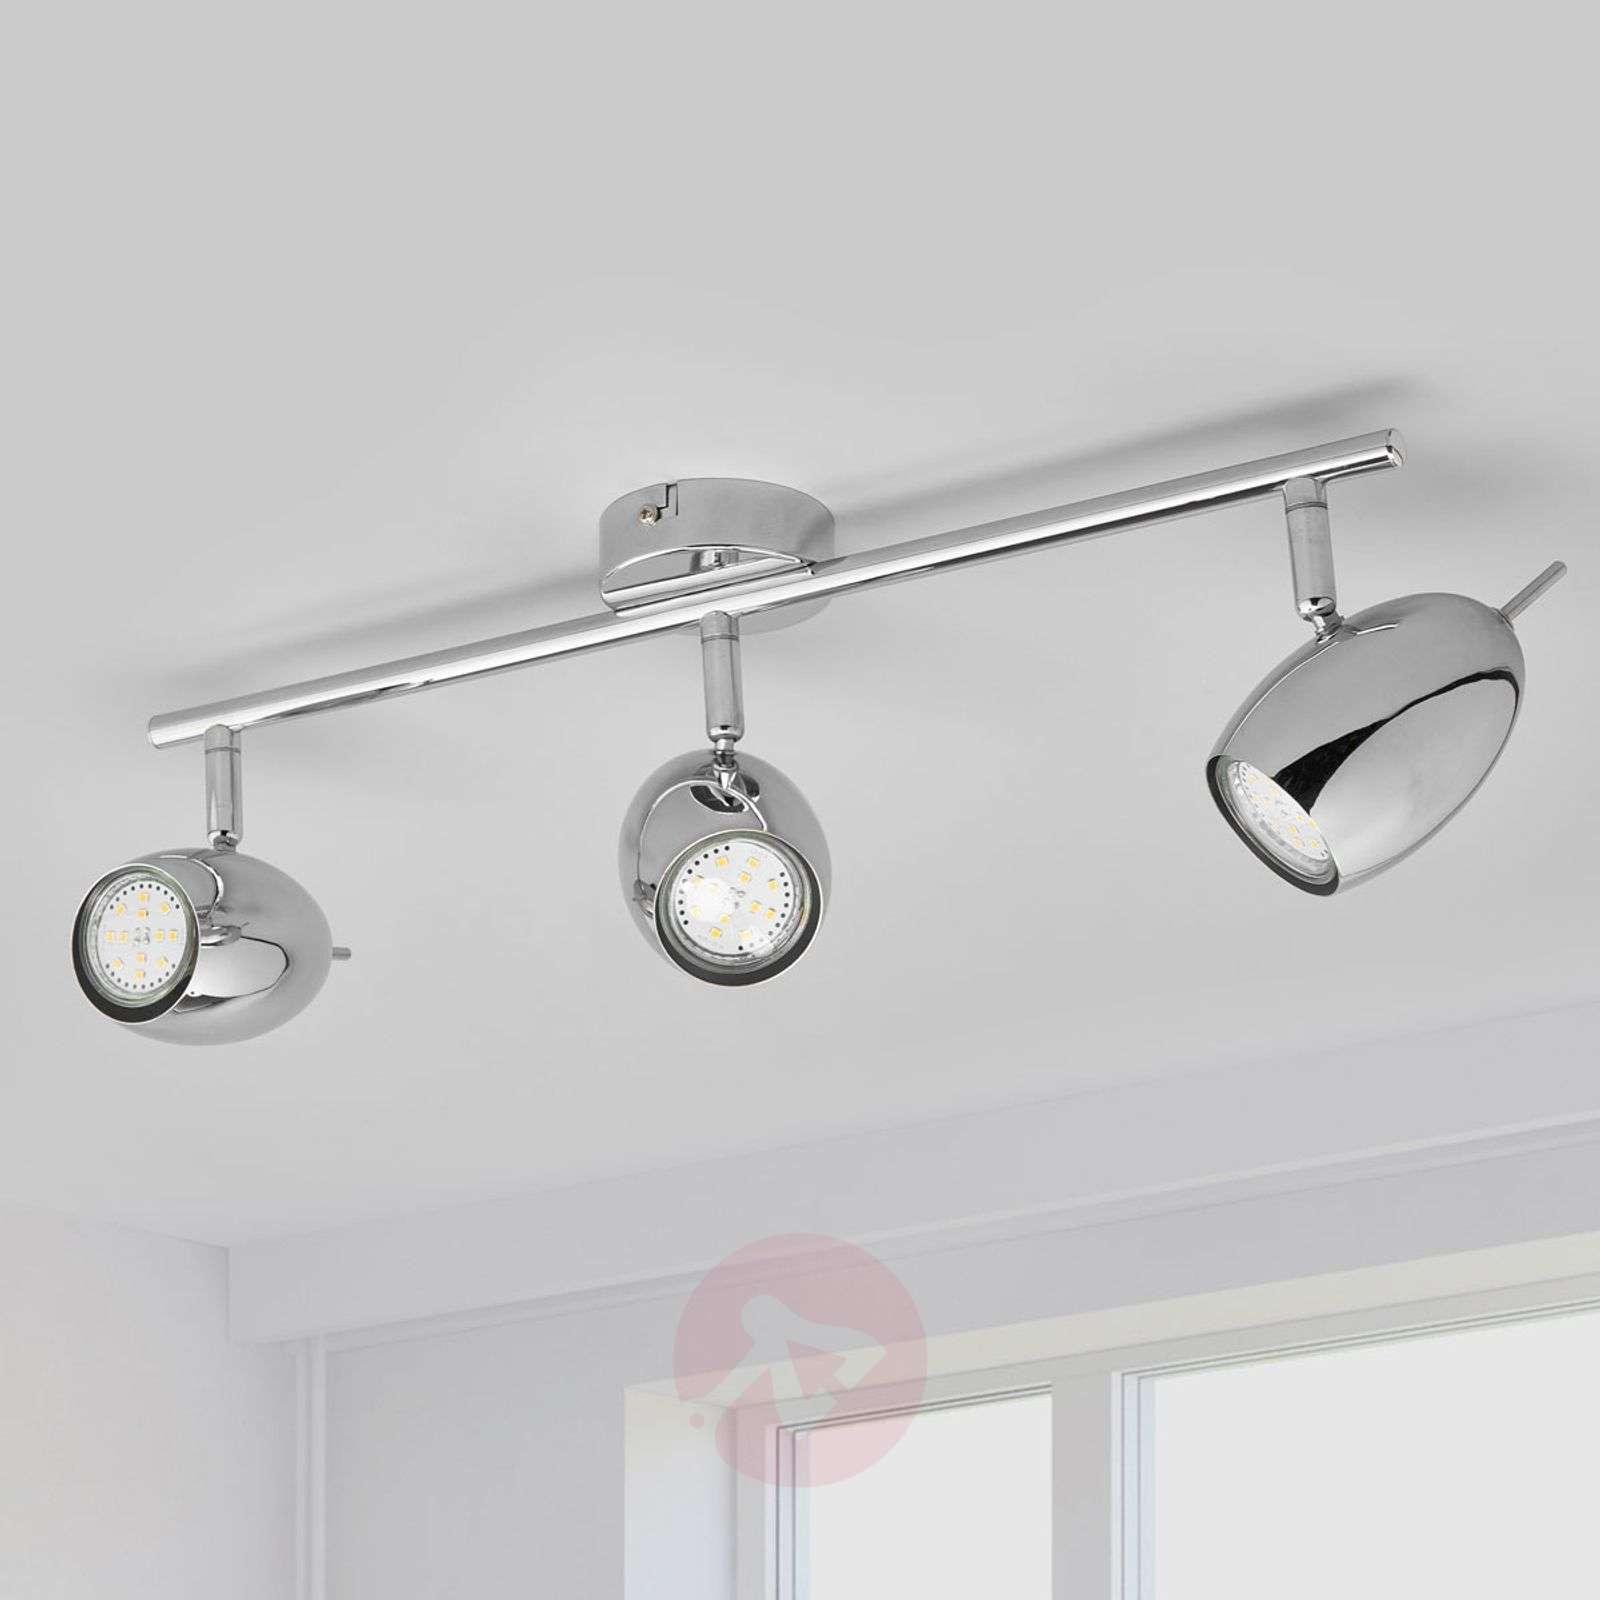 3-bulb LED ceiling lamp Philippa, chrome-plated-9970124-02